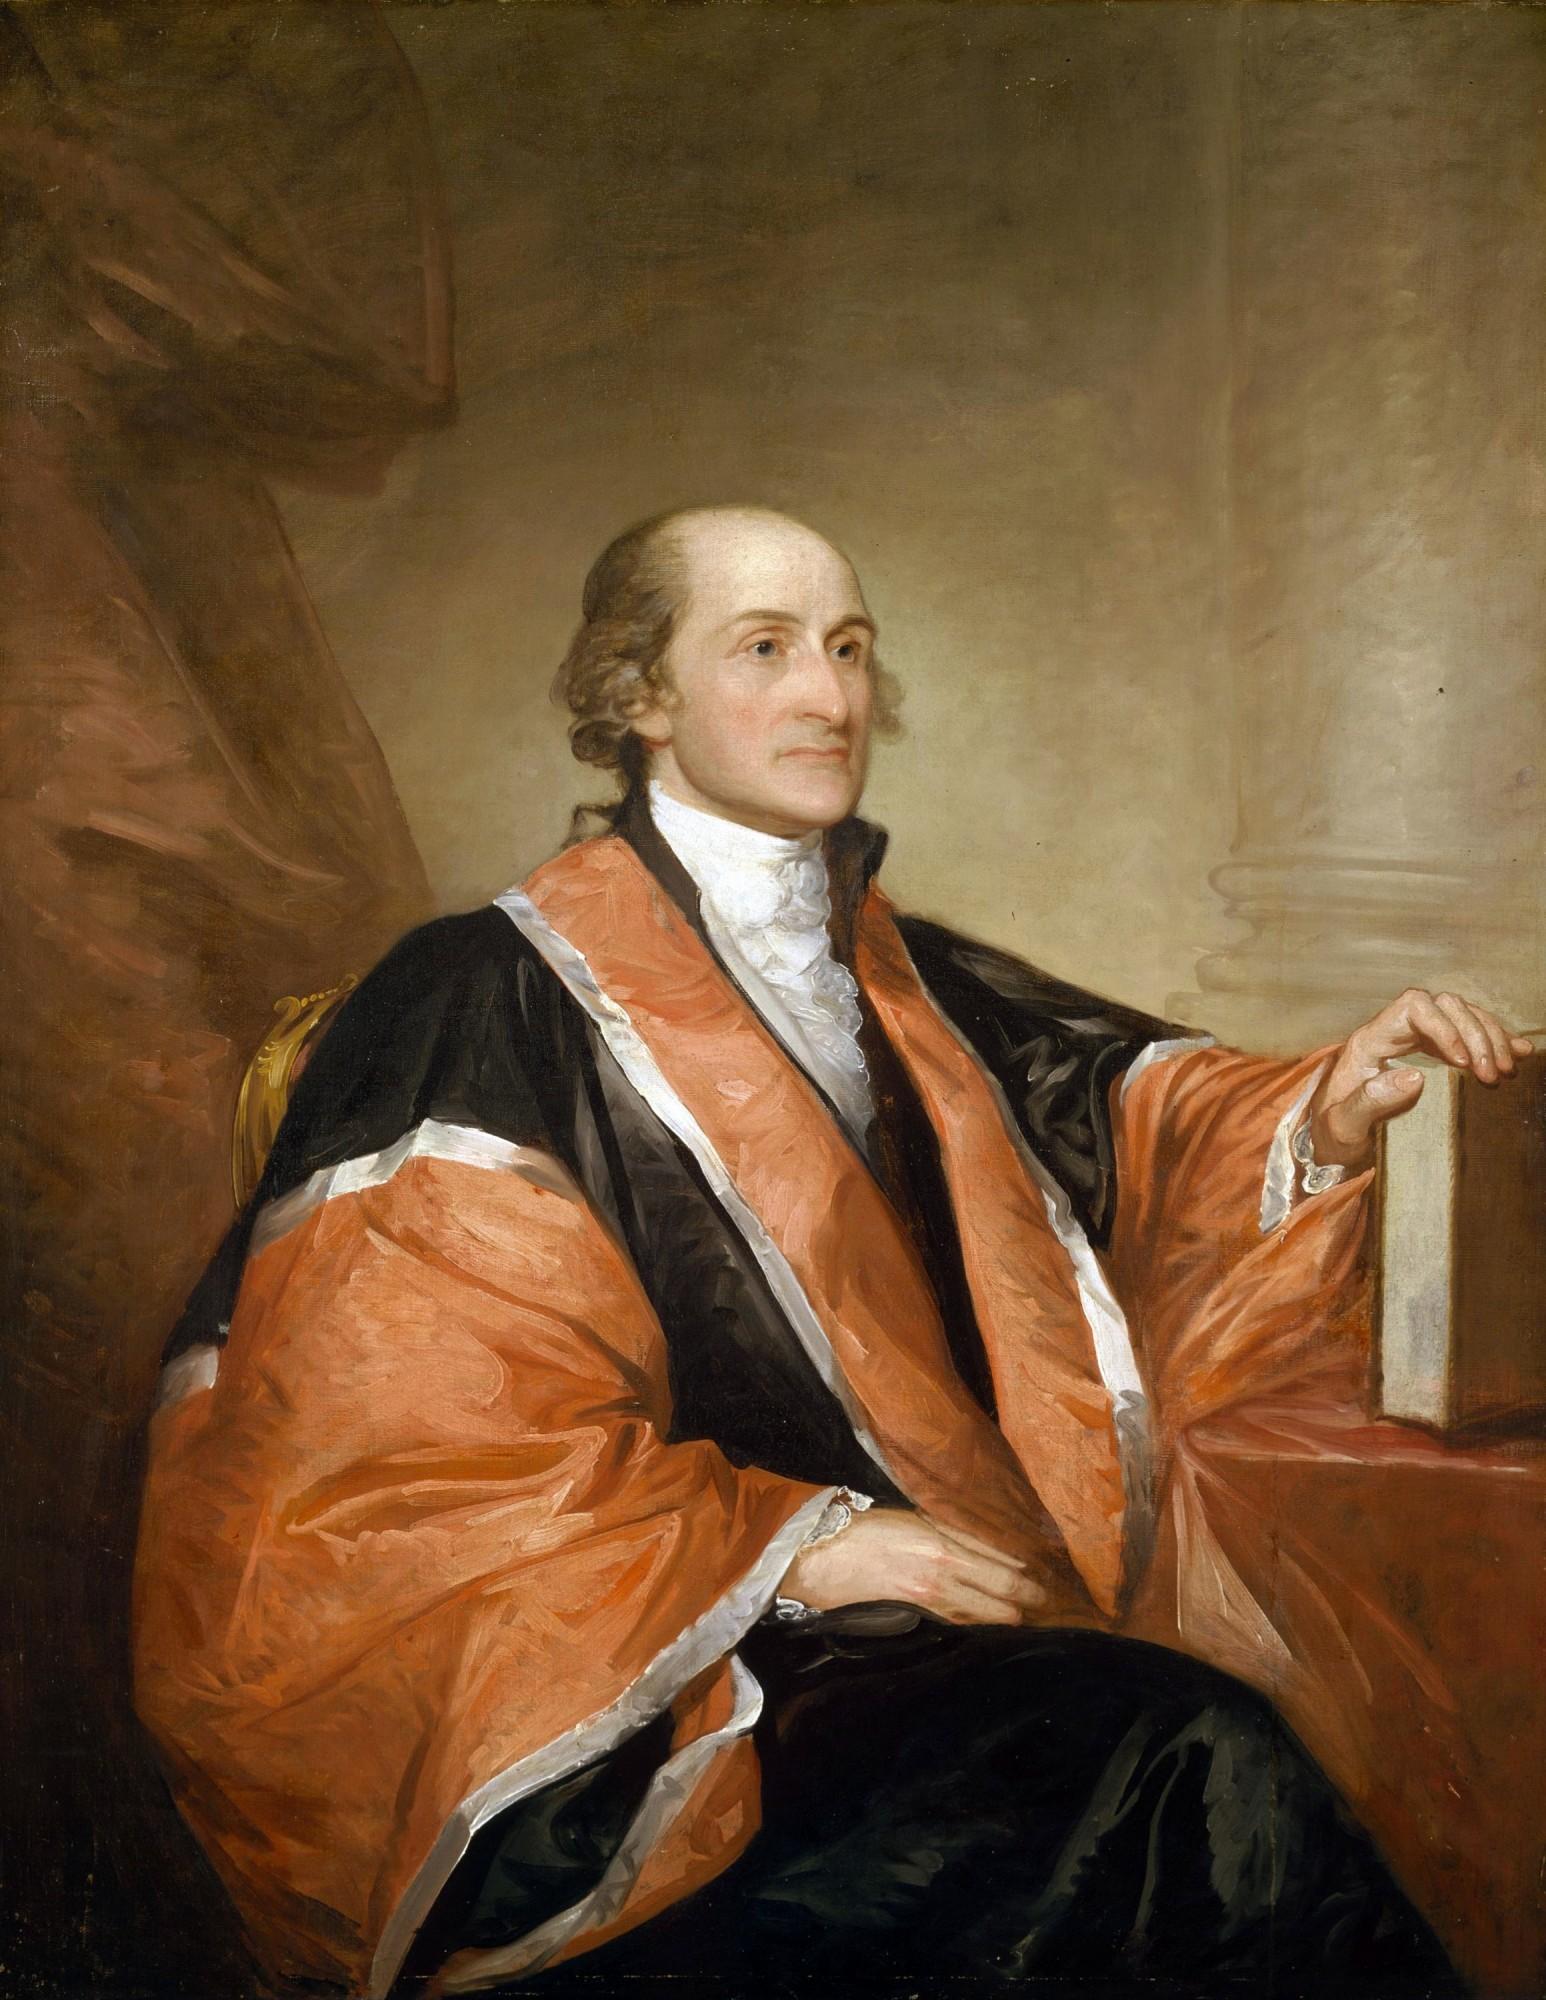 Washington S First 100 Days George Washington S Mount Vernon